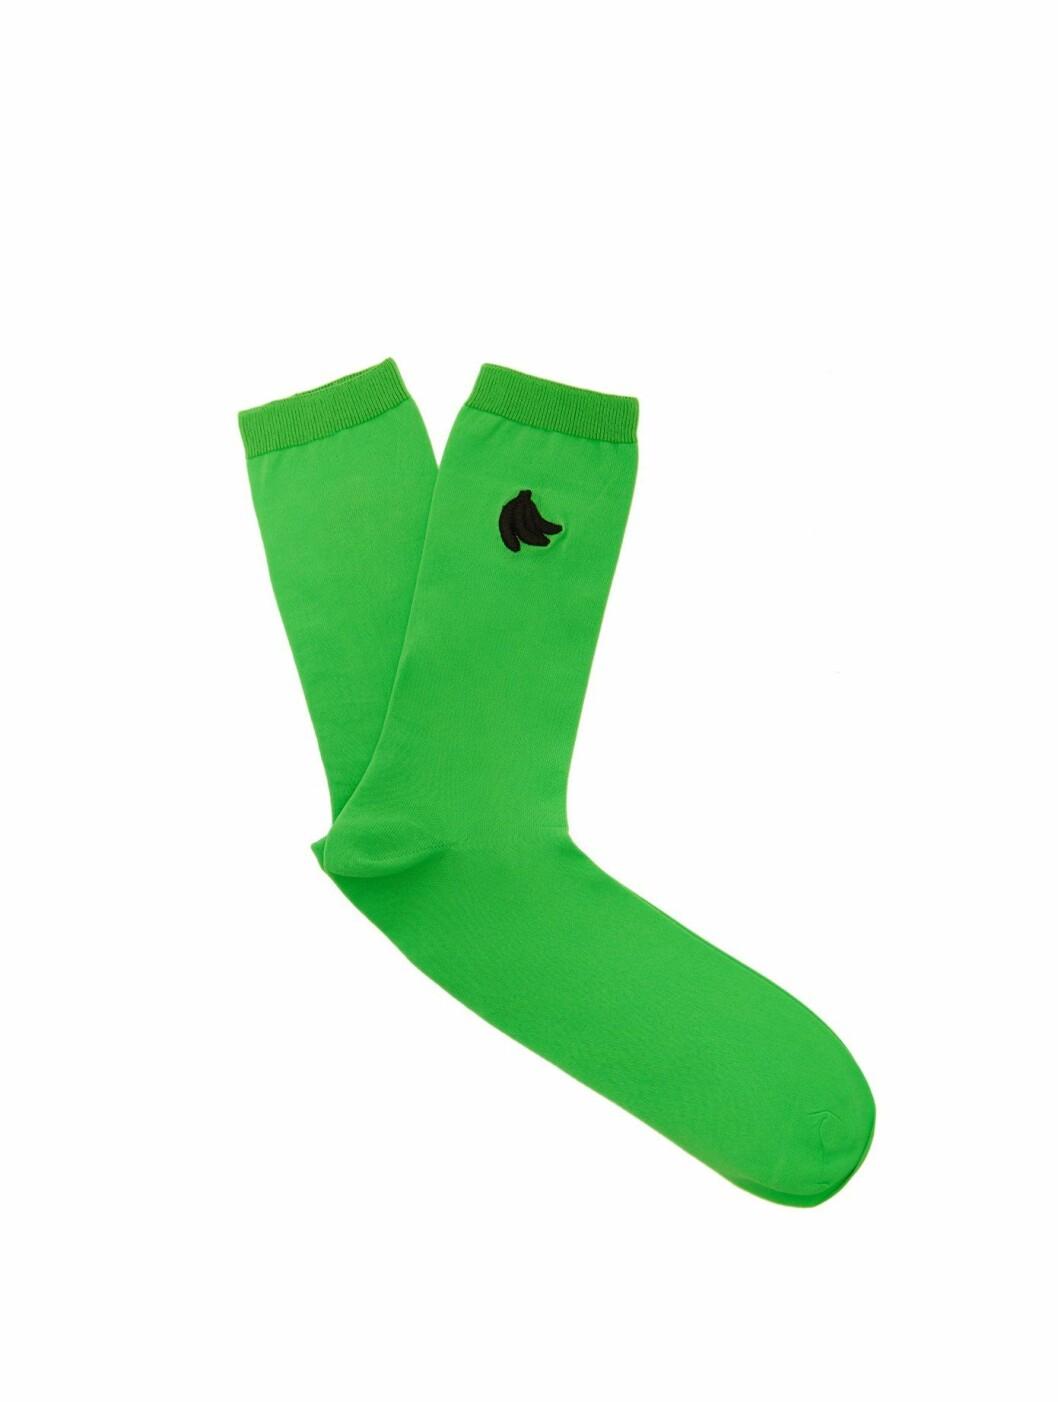 Sokker fra Ganni |165,-| https://www.matchesfashion.com/intl/products/Ganni-Banana-embroidered-socks-1262487